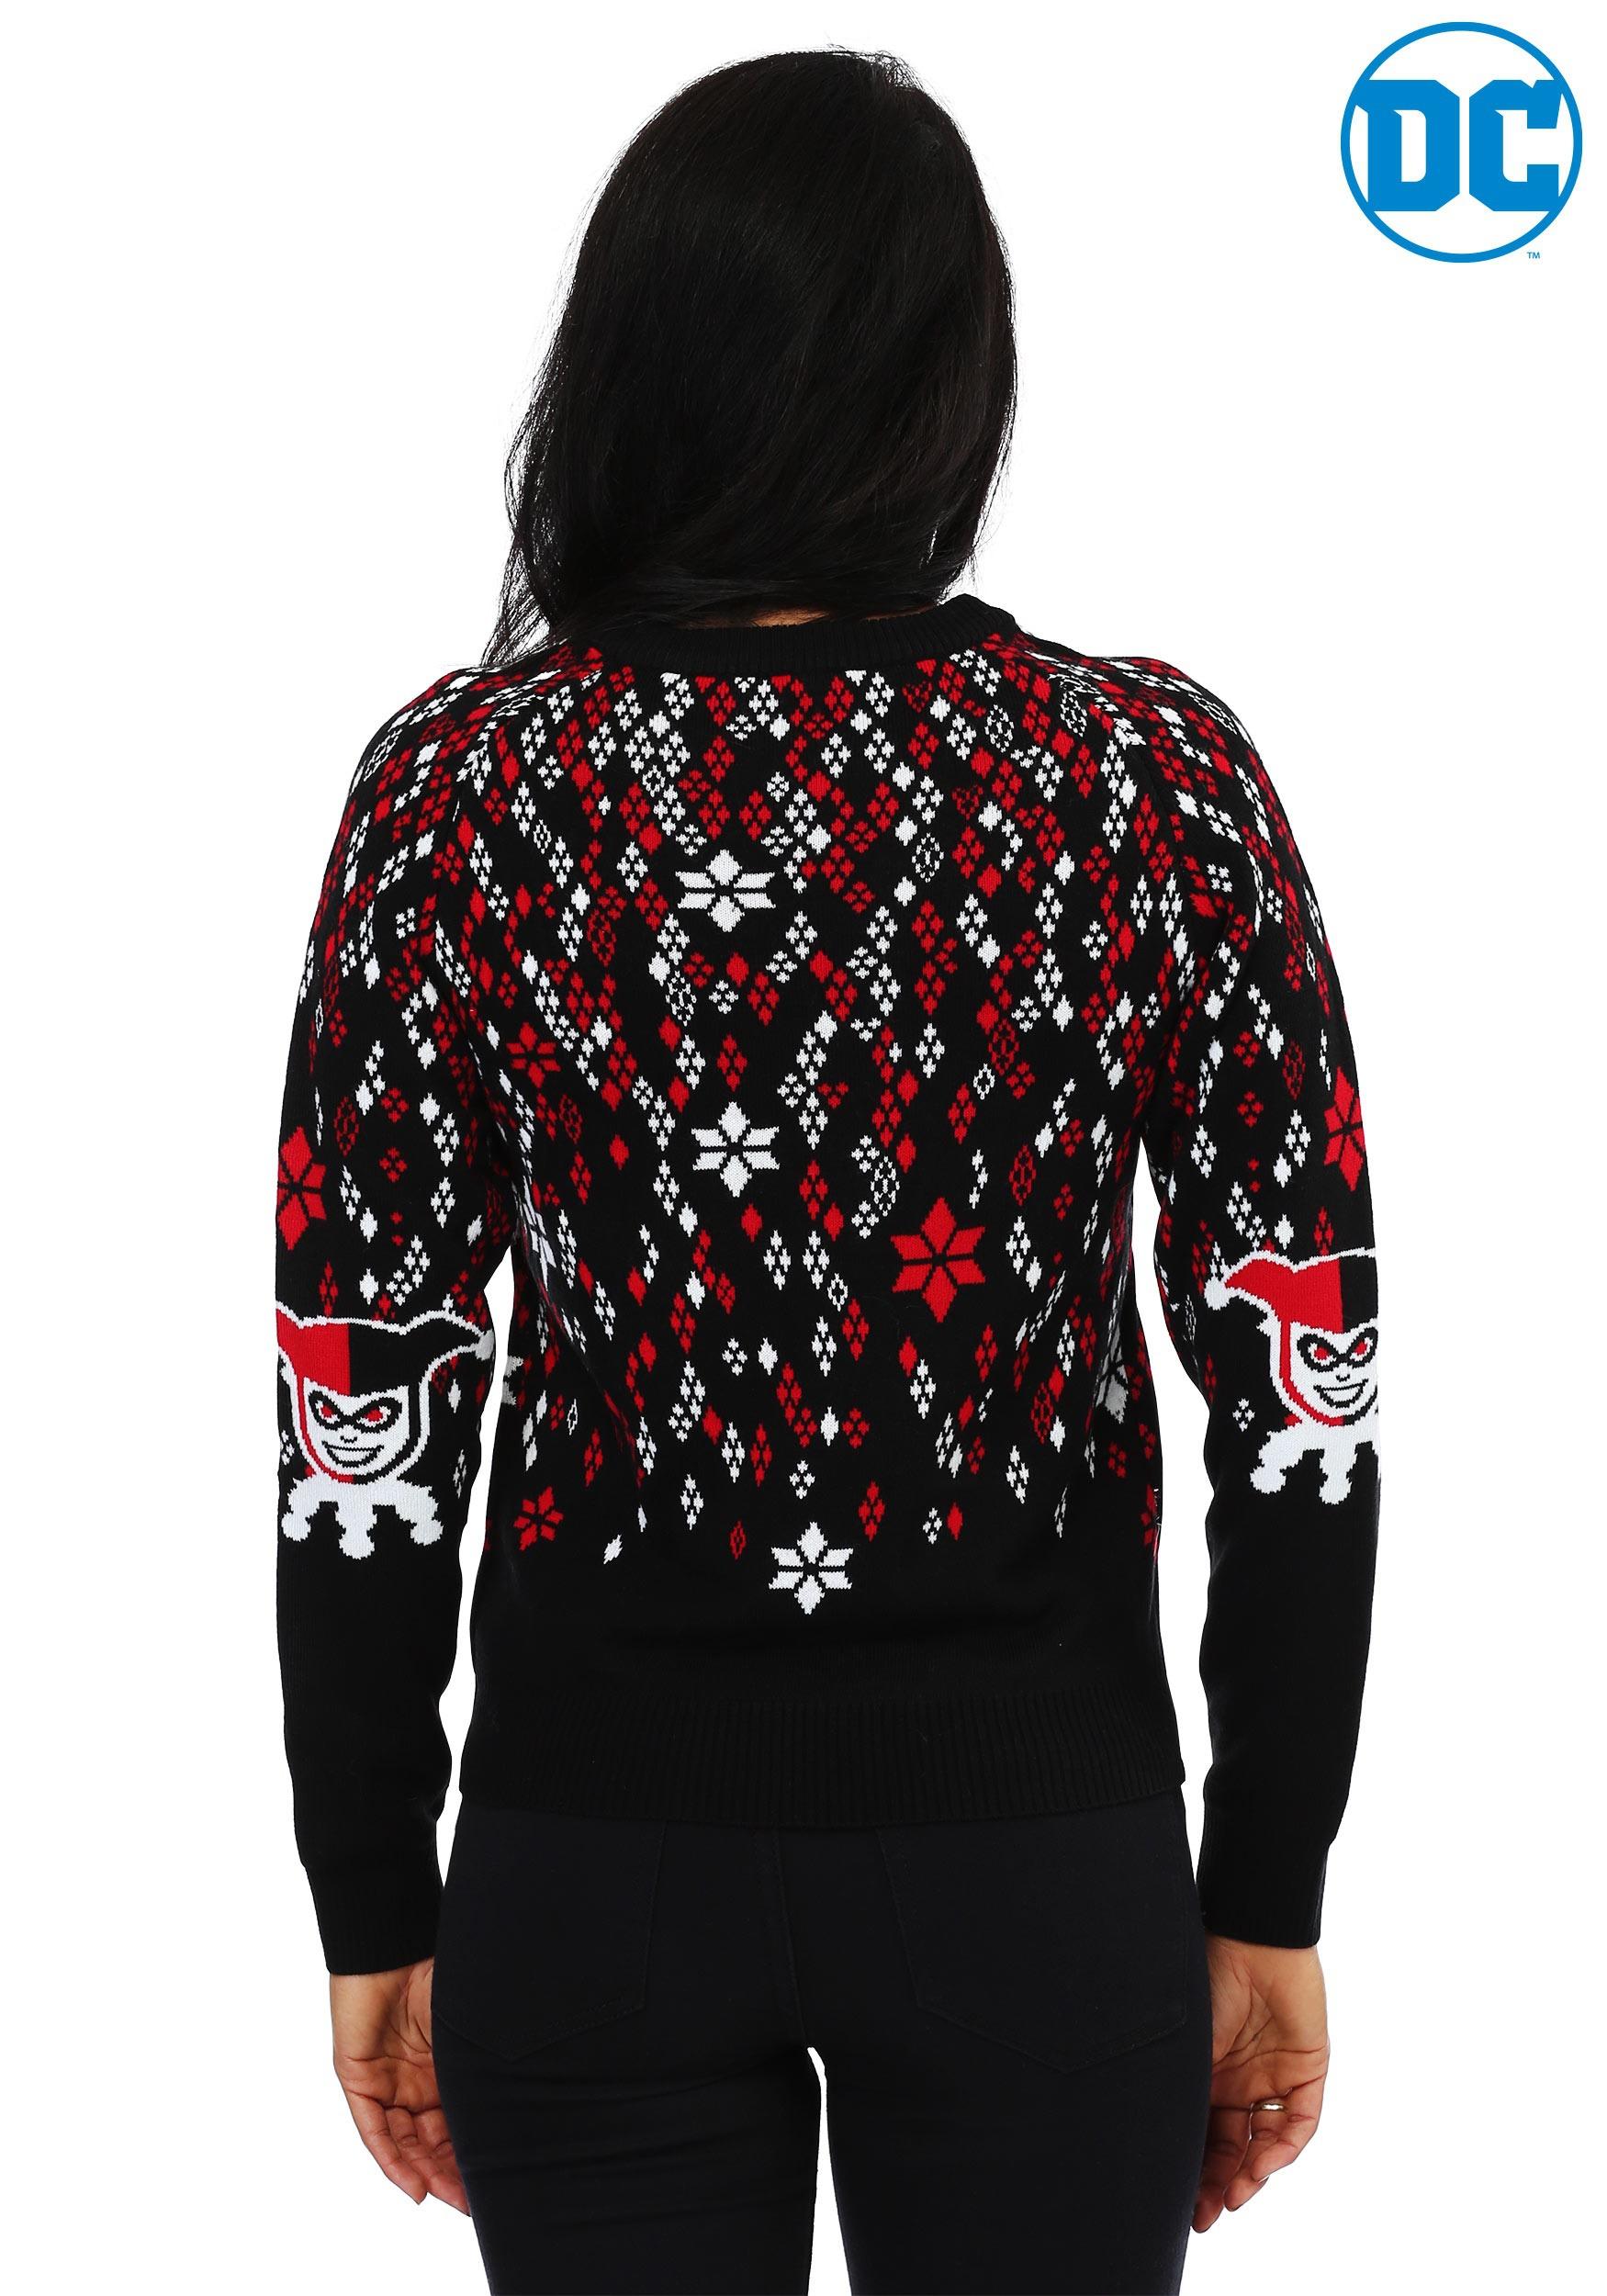 harley quinn diamond womens ugly christmas sweater - Christmas Jacket